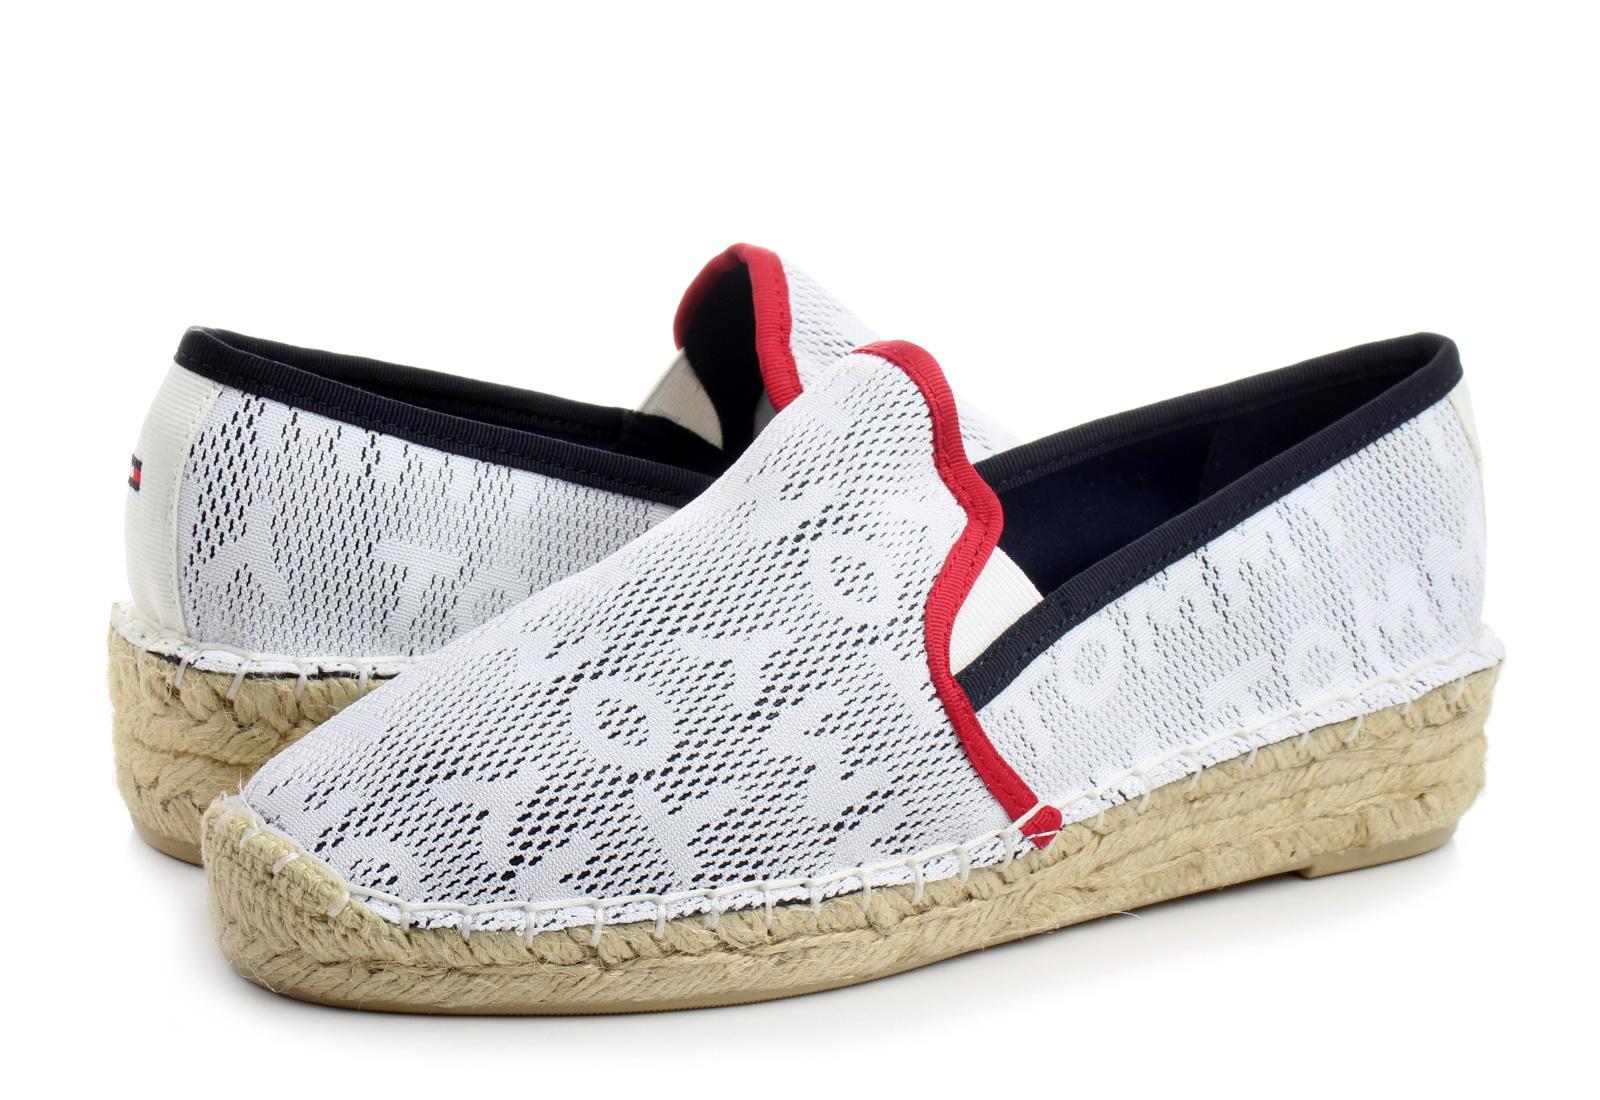 Tommy Hilfiger Shoes Hazel 1c2 19S 0602 100 Online